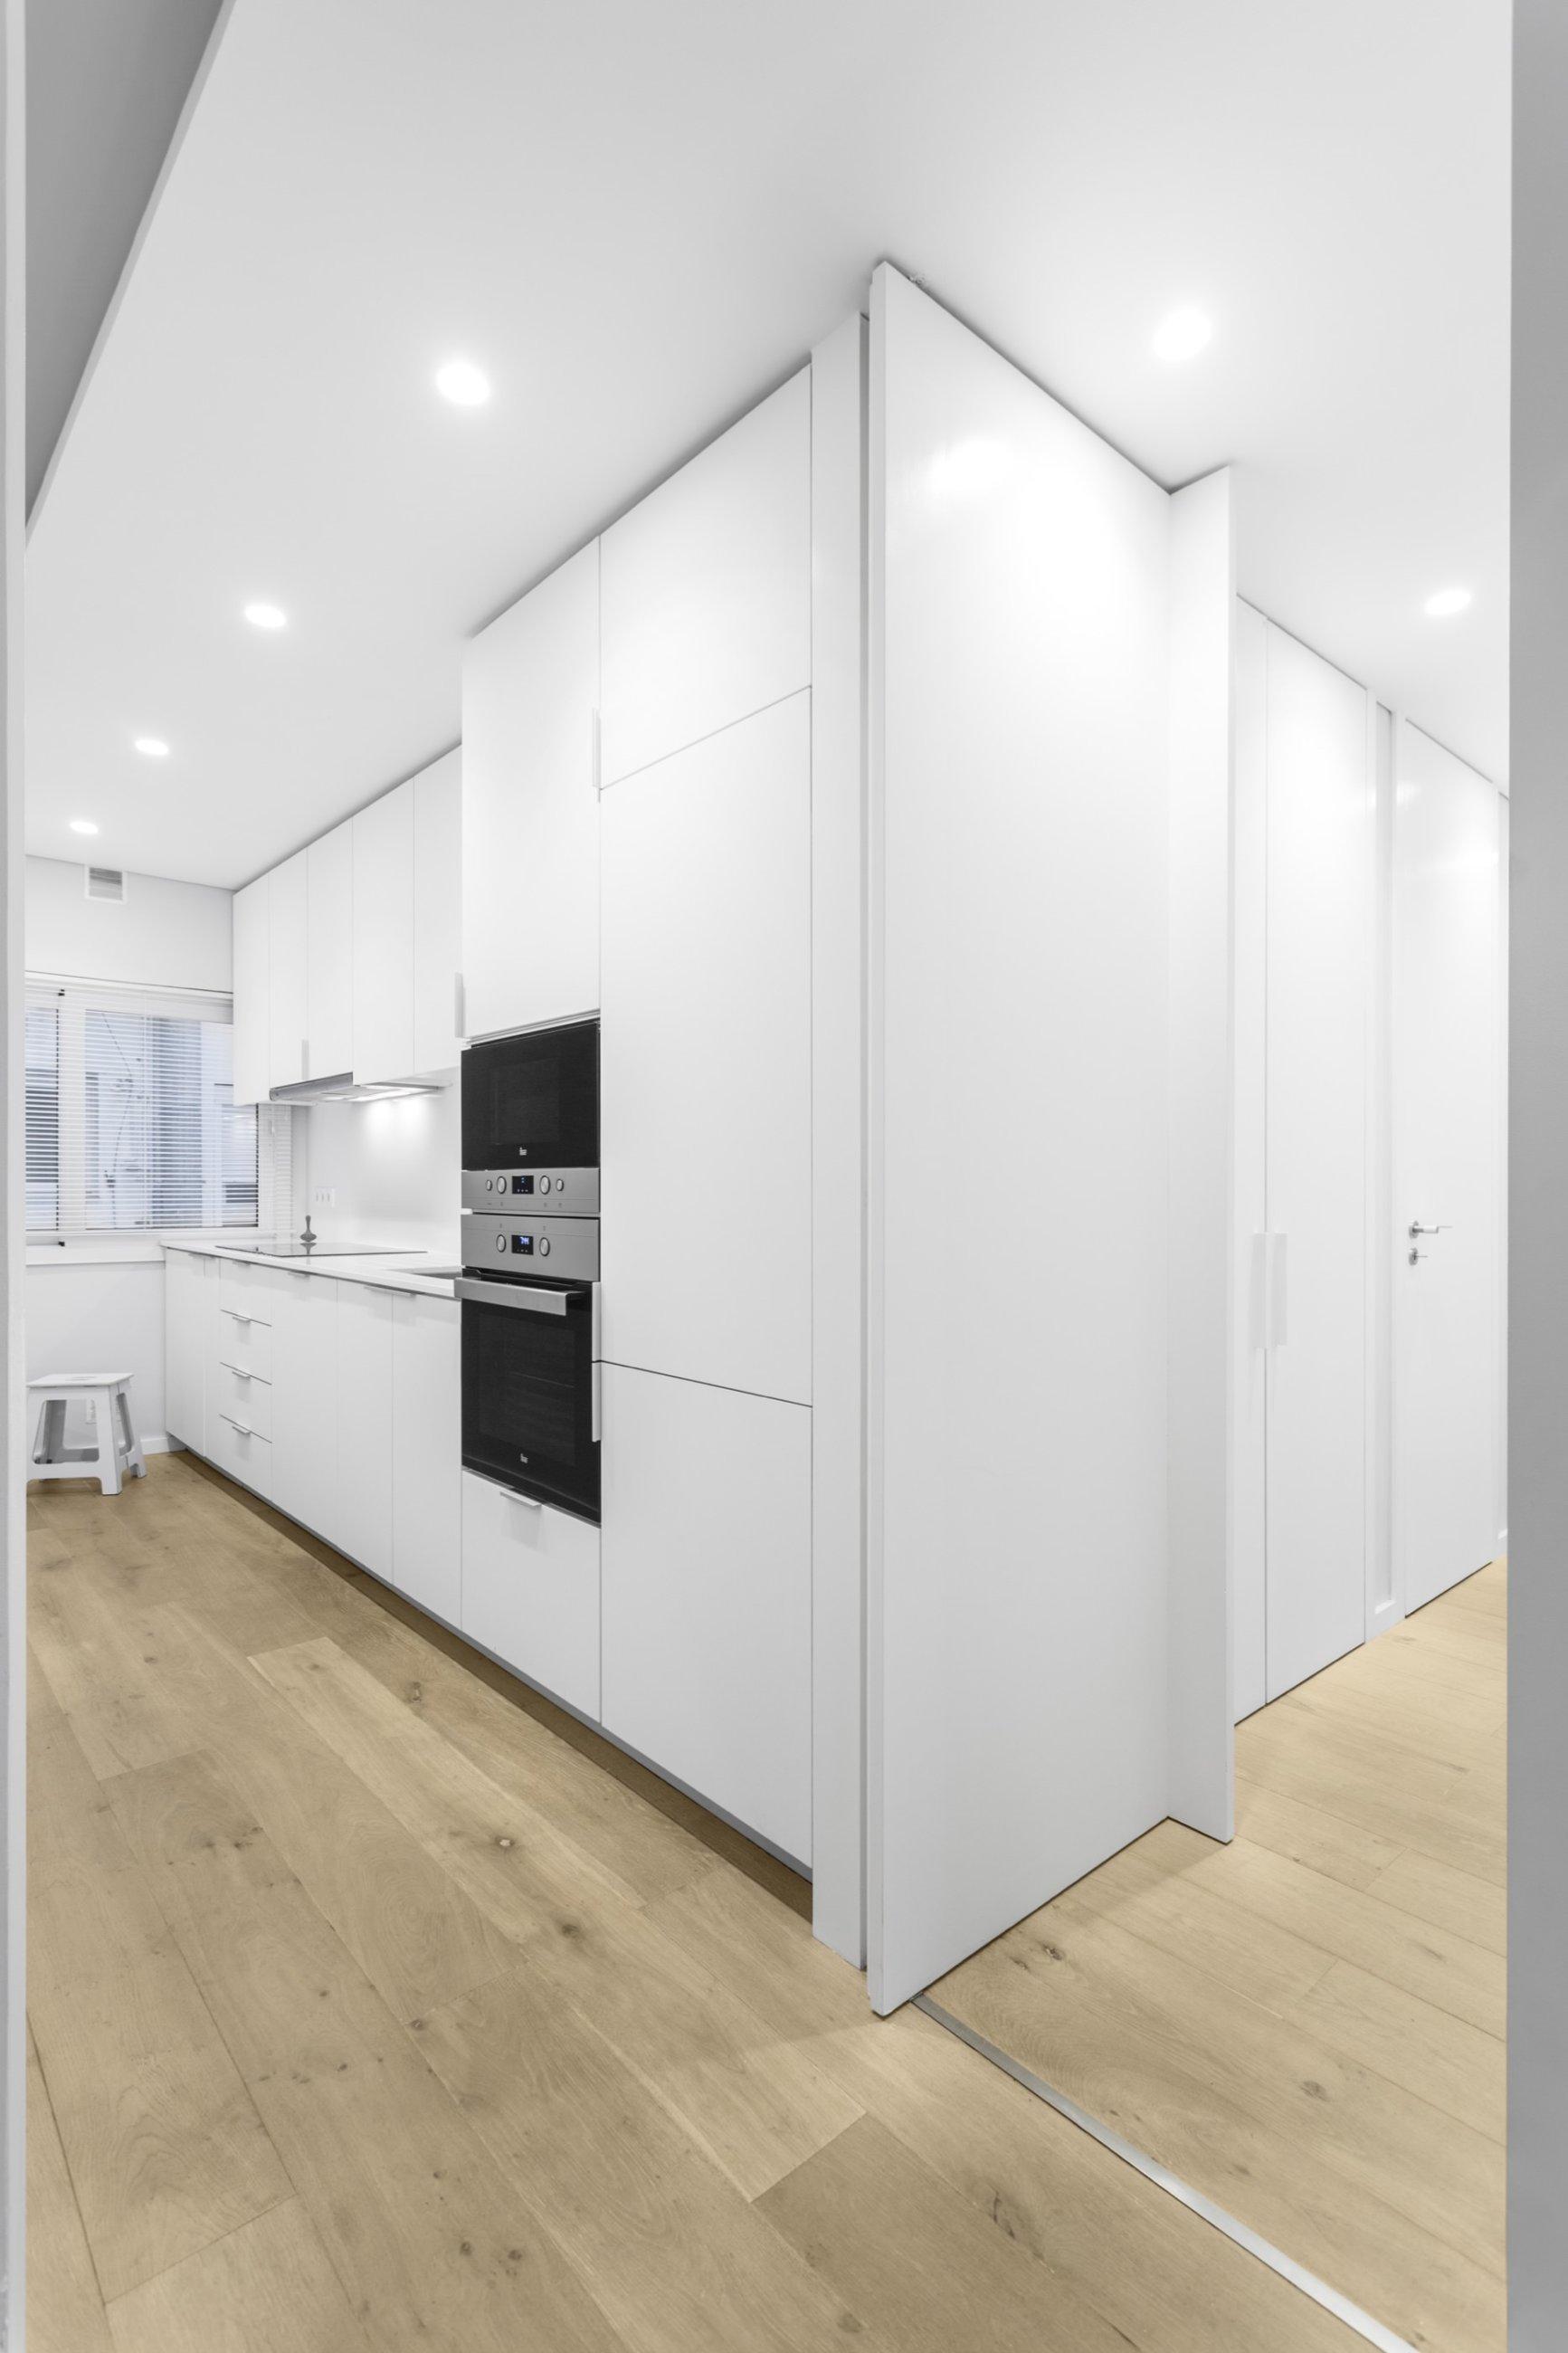 Apartamento Barcelona Arquitecto Paulo Martins 29 do fotografo Ivo Tavares Studio